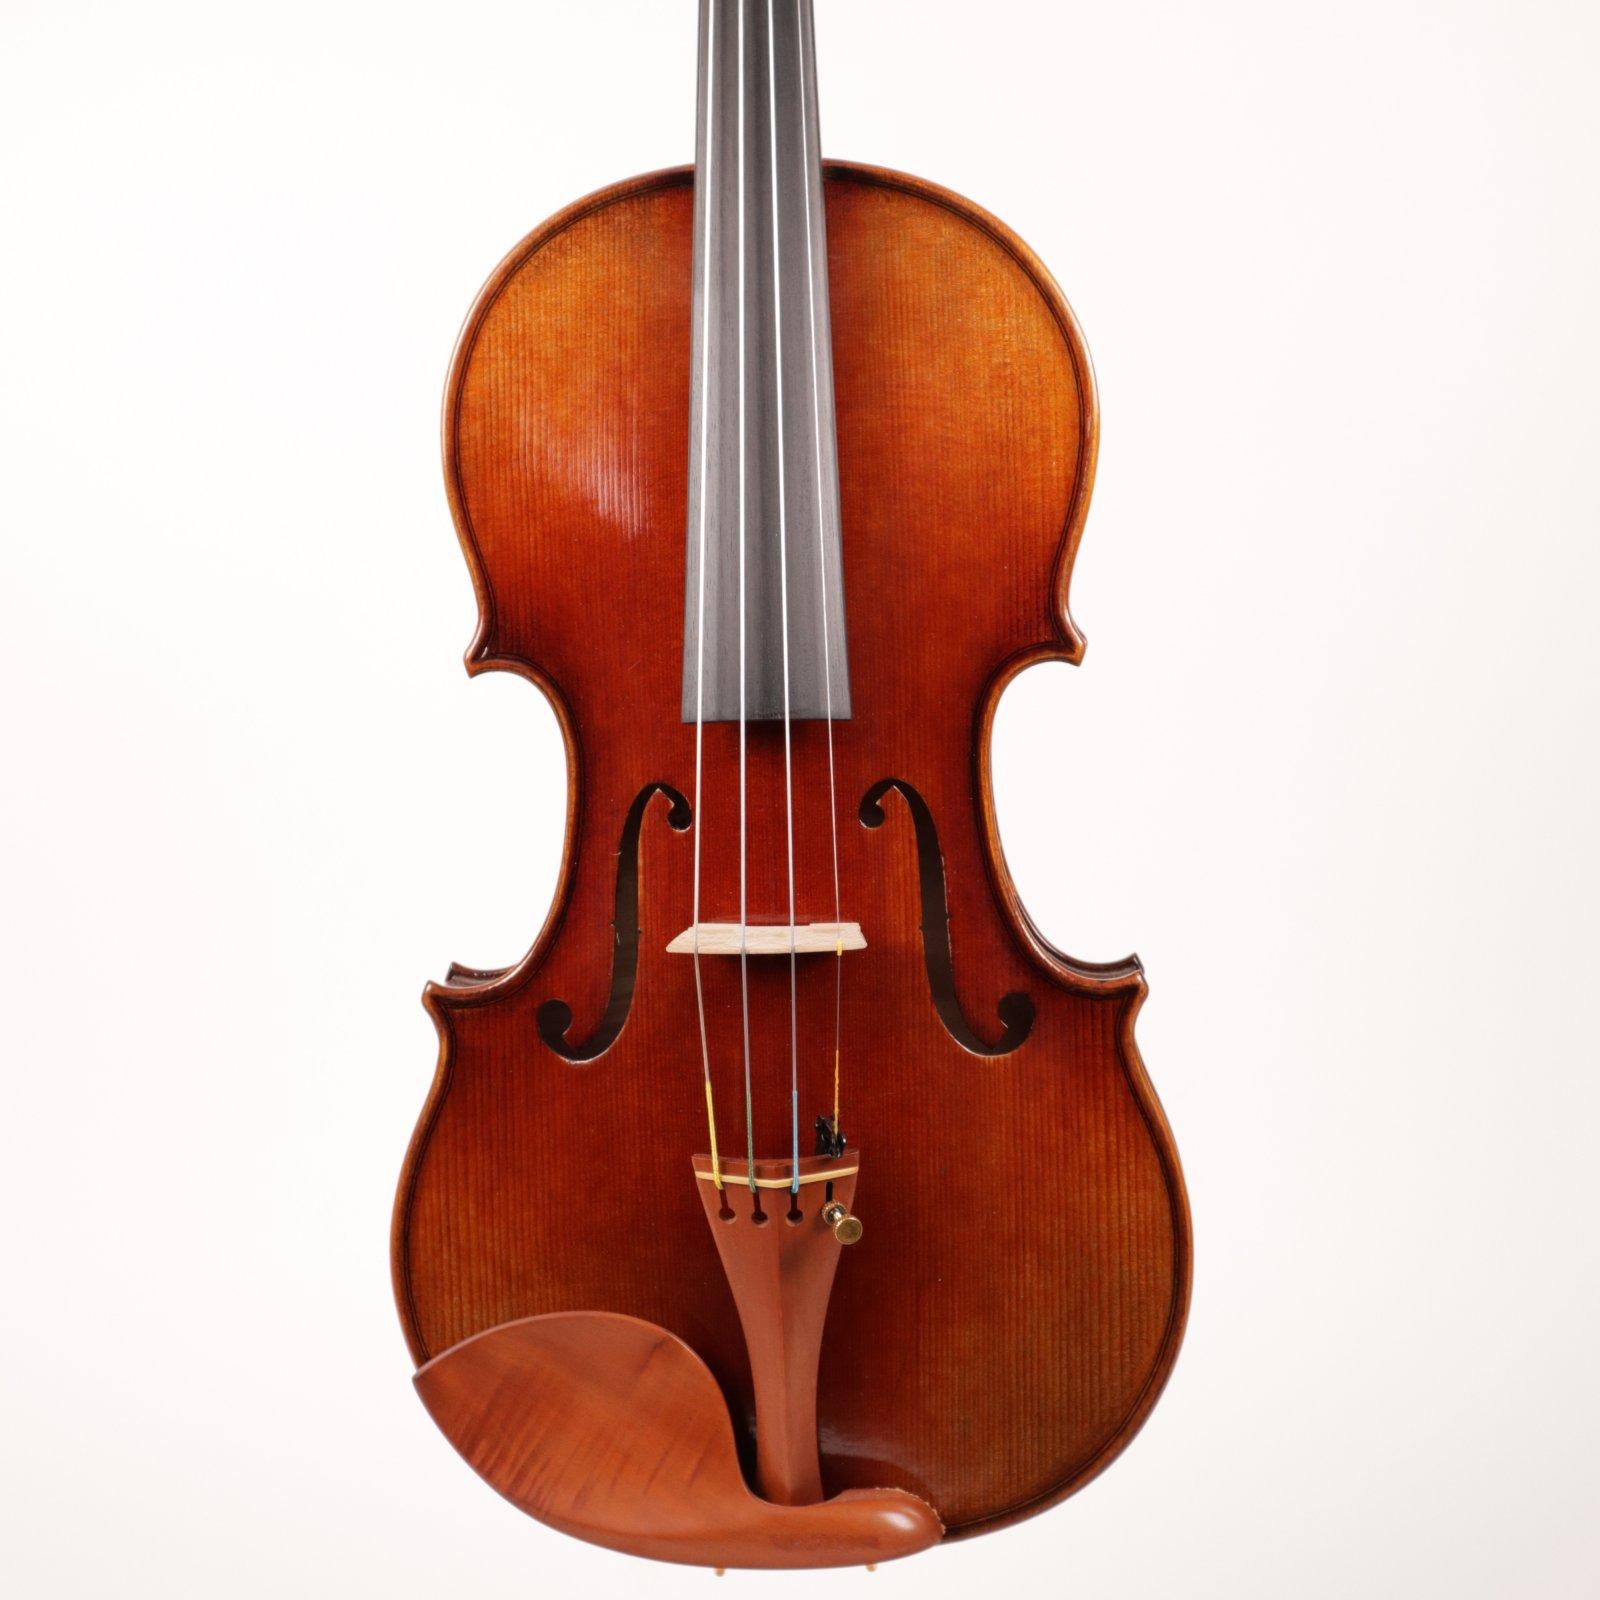 Francesco Amati Violins